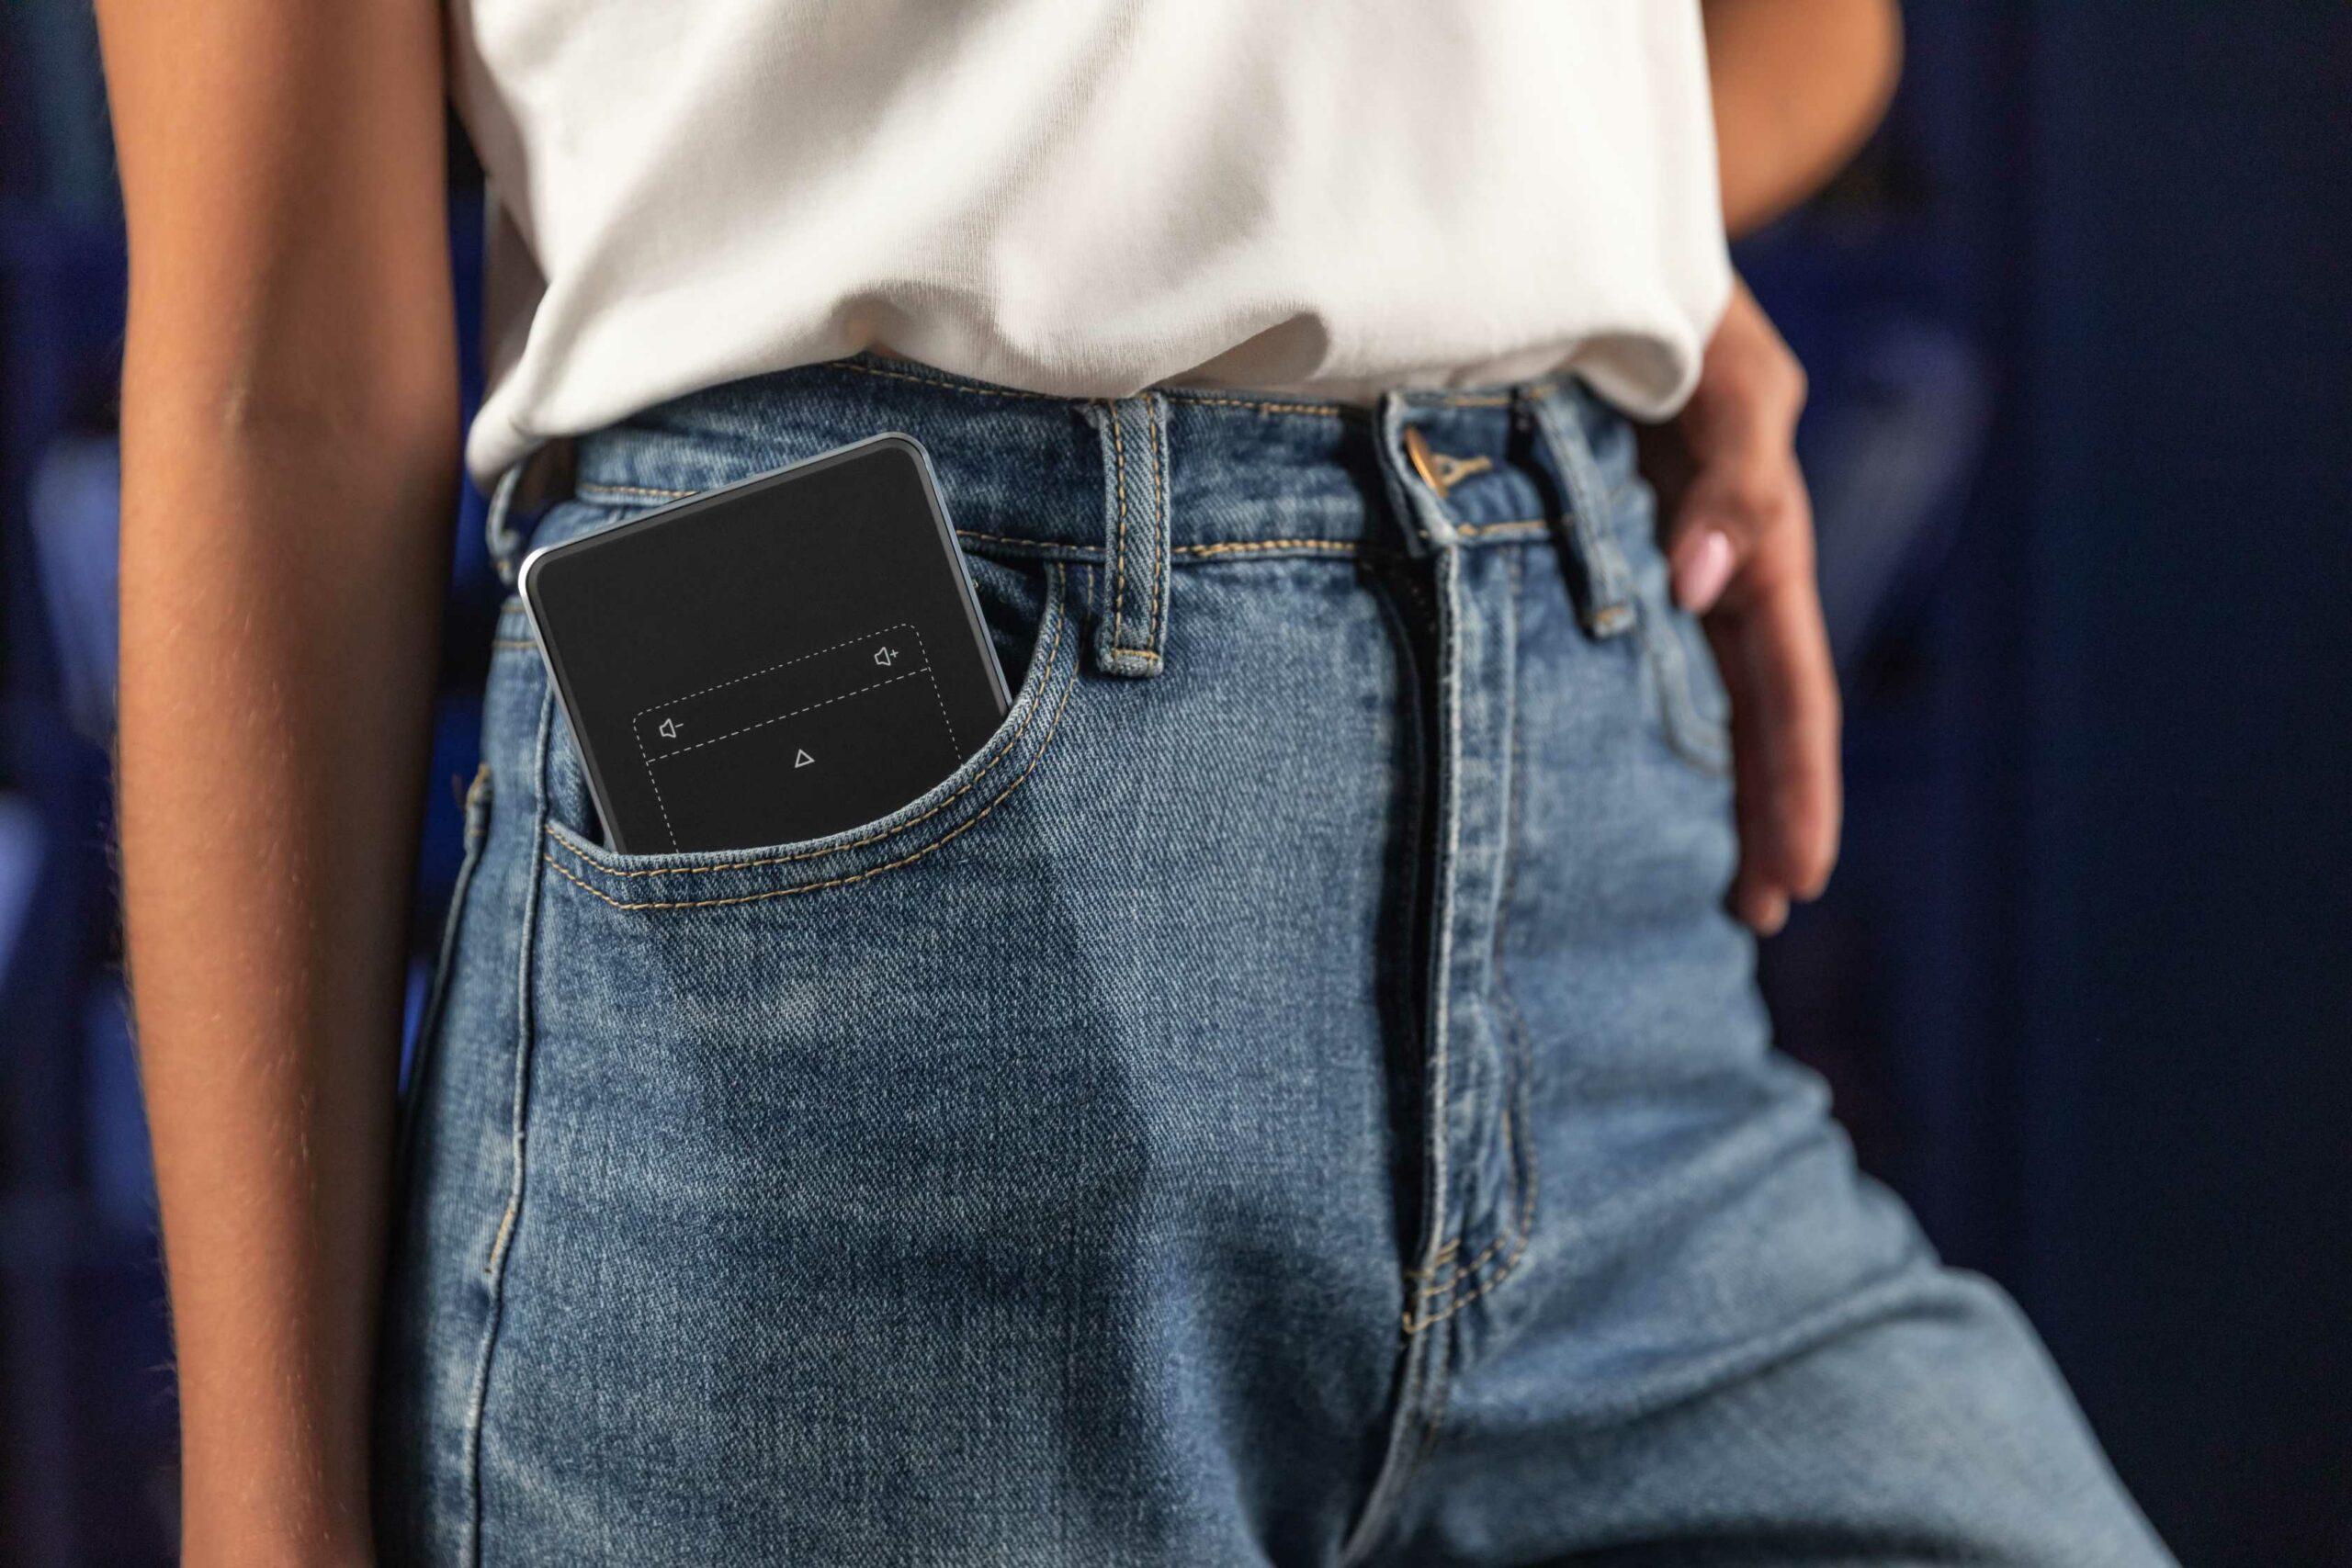 Prima 超薄口袋投影機